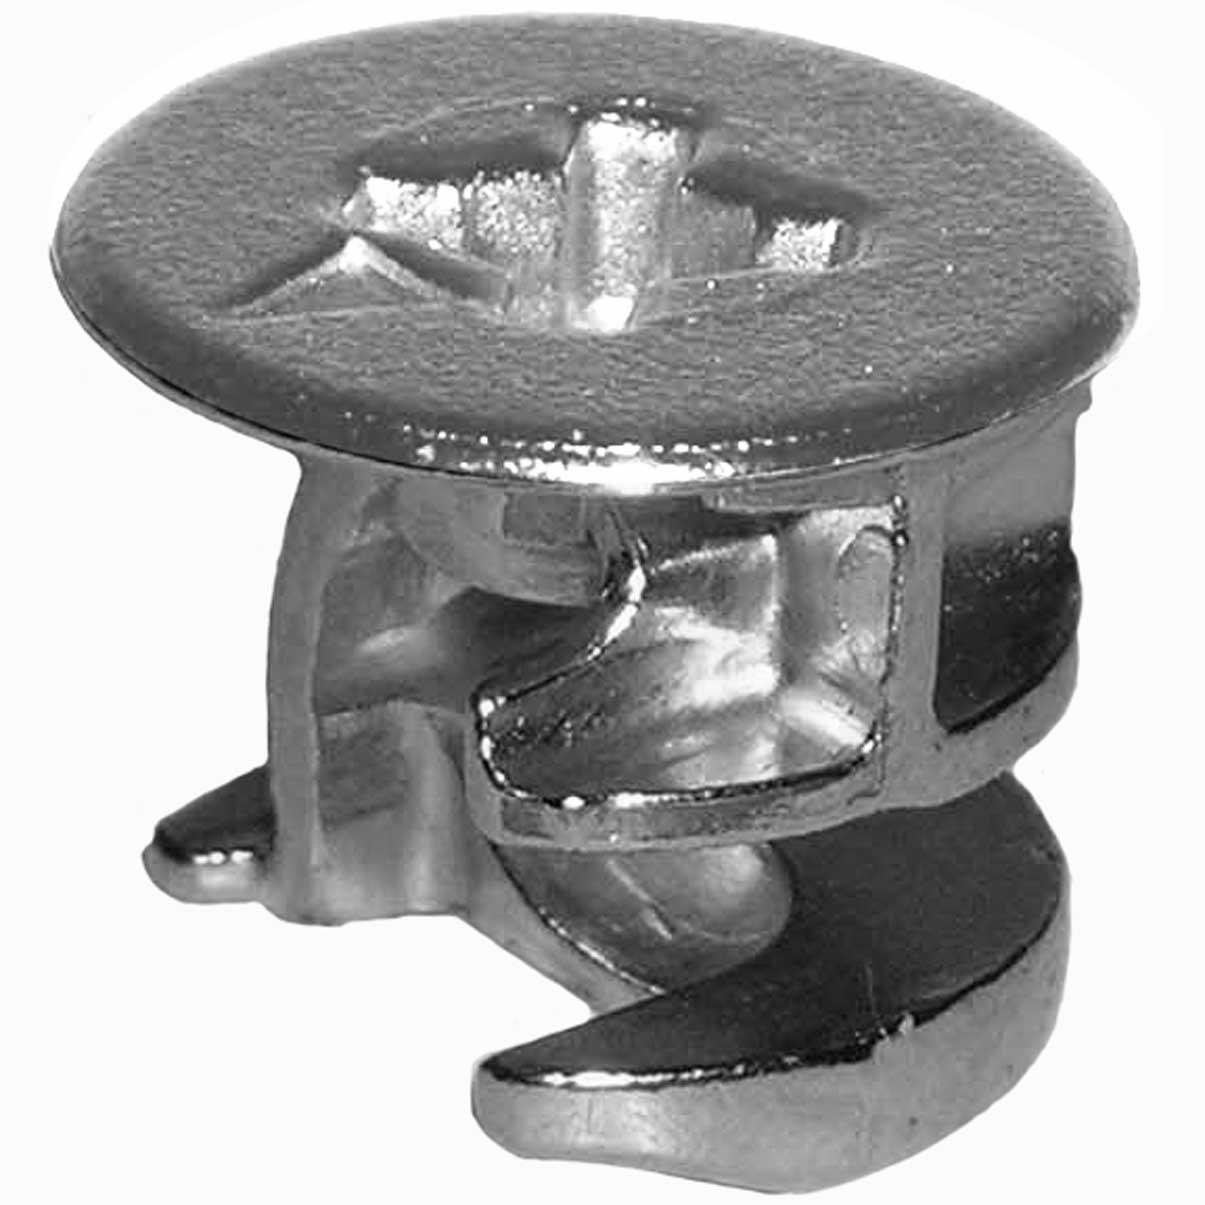 15mm X 12mm Rimmed Cam Lock Fasteners 4 Pk Furniture